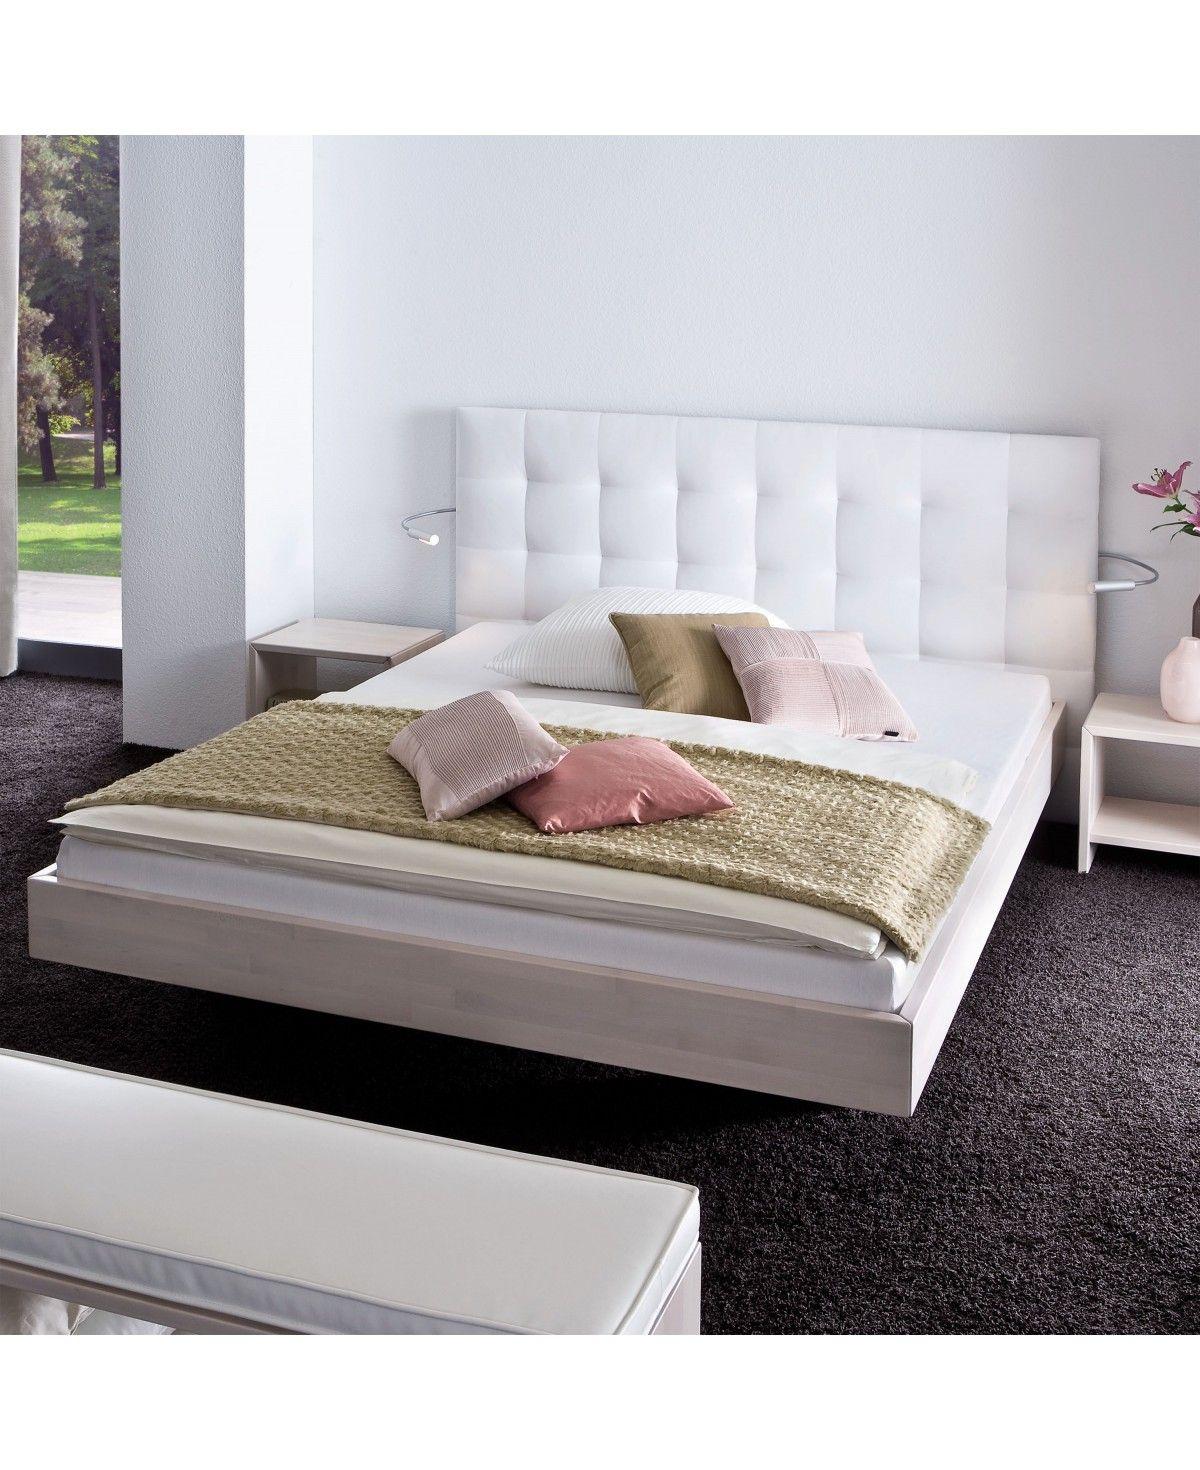 Hasena Wood Line Bett Wandpaneel Sogno L Fusse Vilo Buche Weiss 200x220